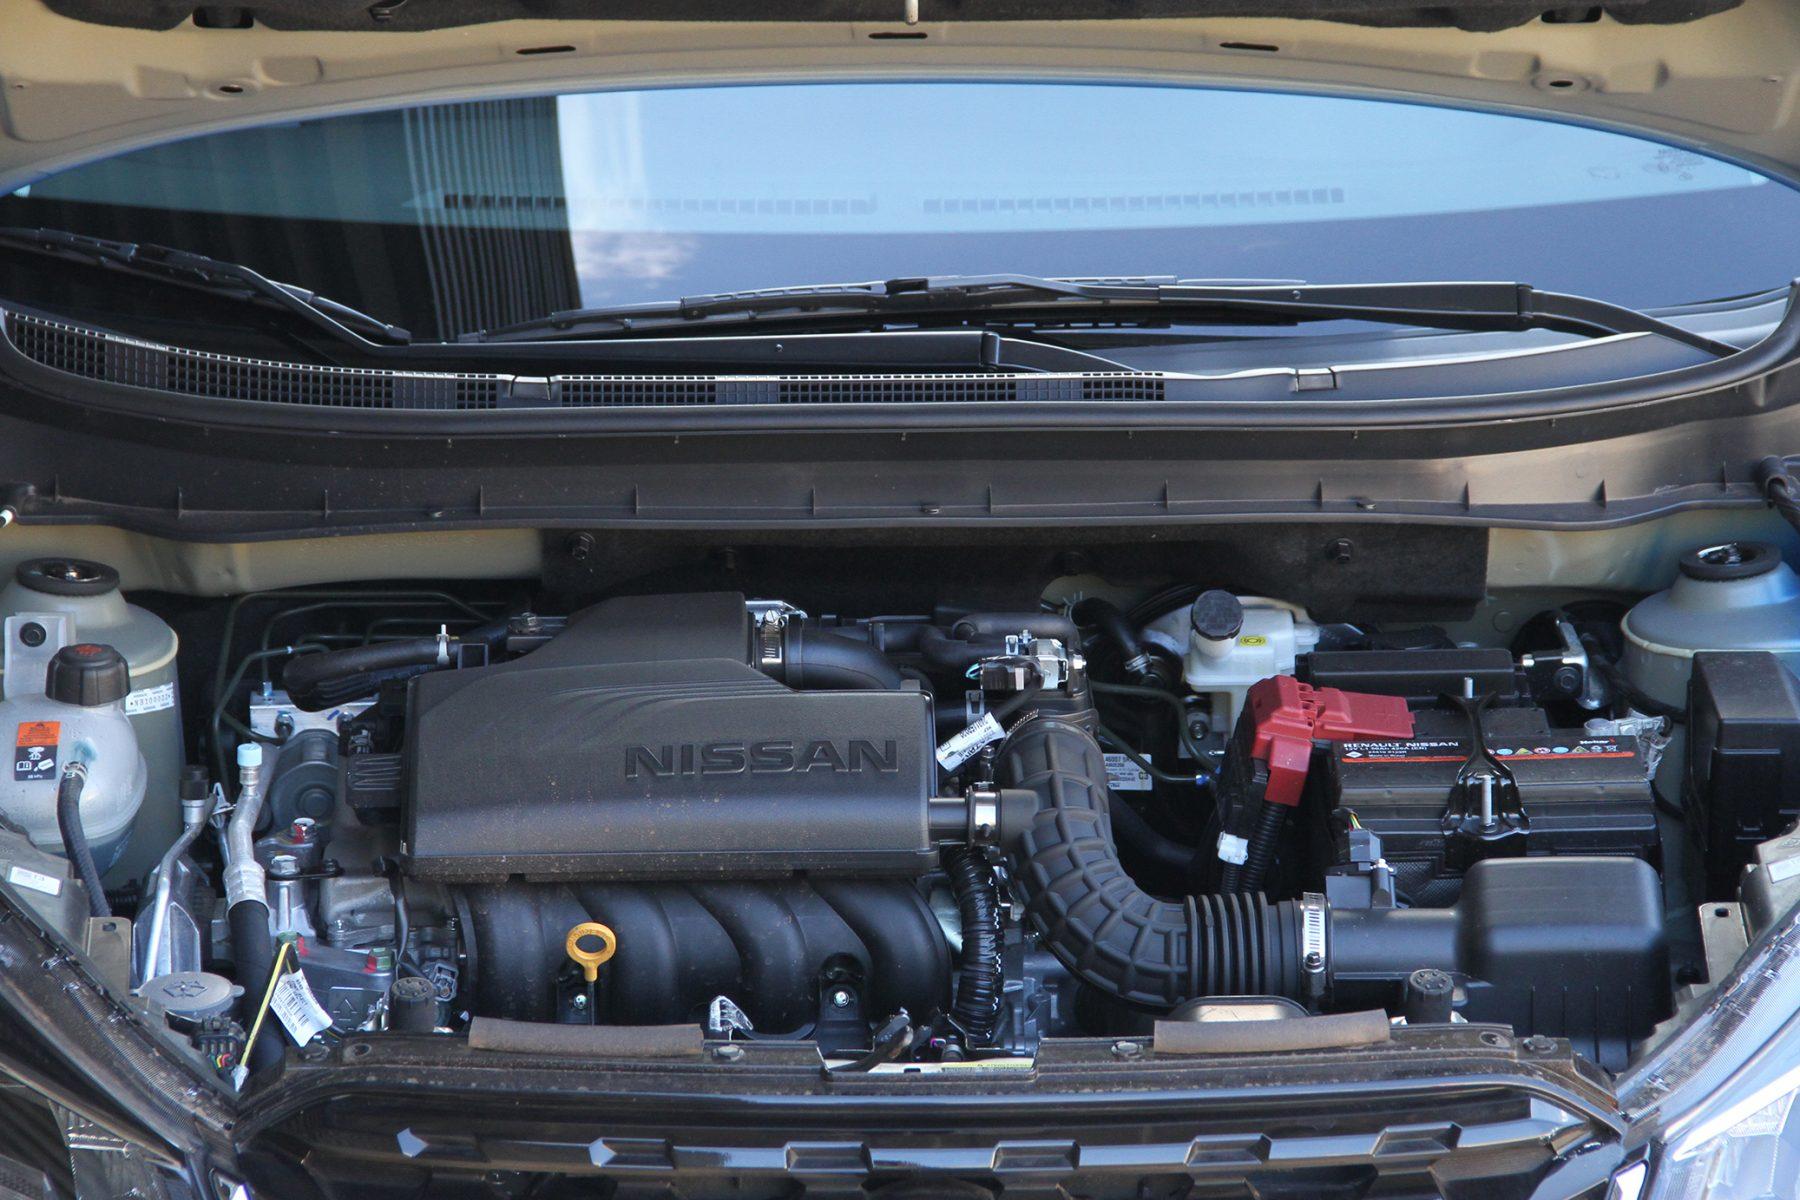 nissan kicks exclusive 2021 motor foto alexandre carneiro autopapo 4977